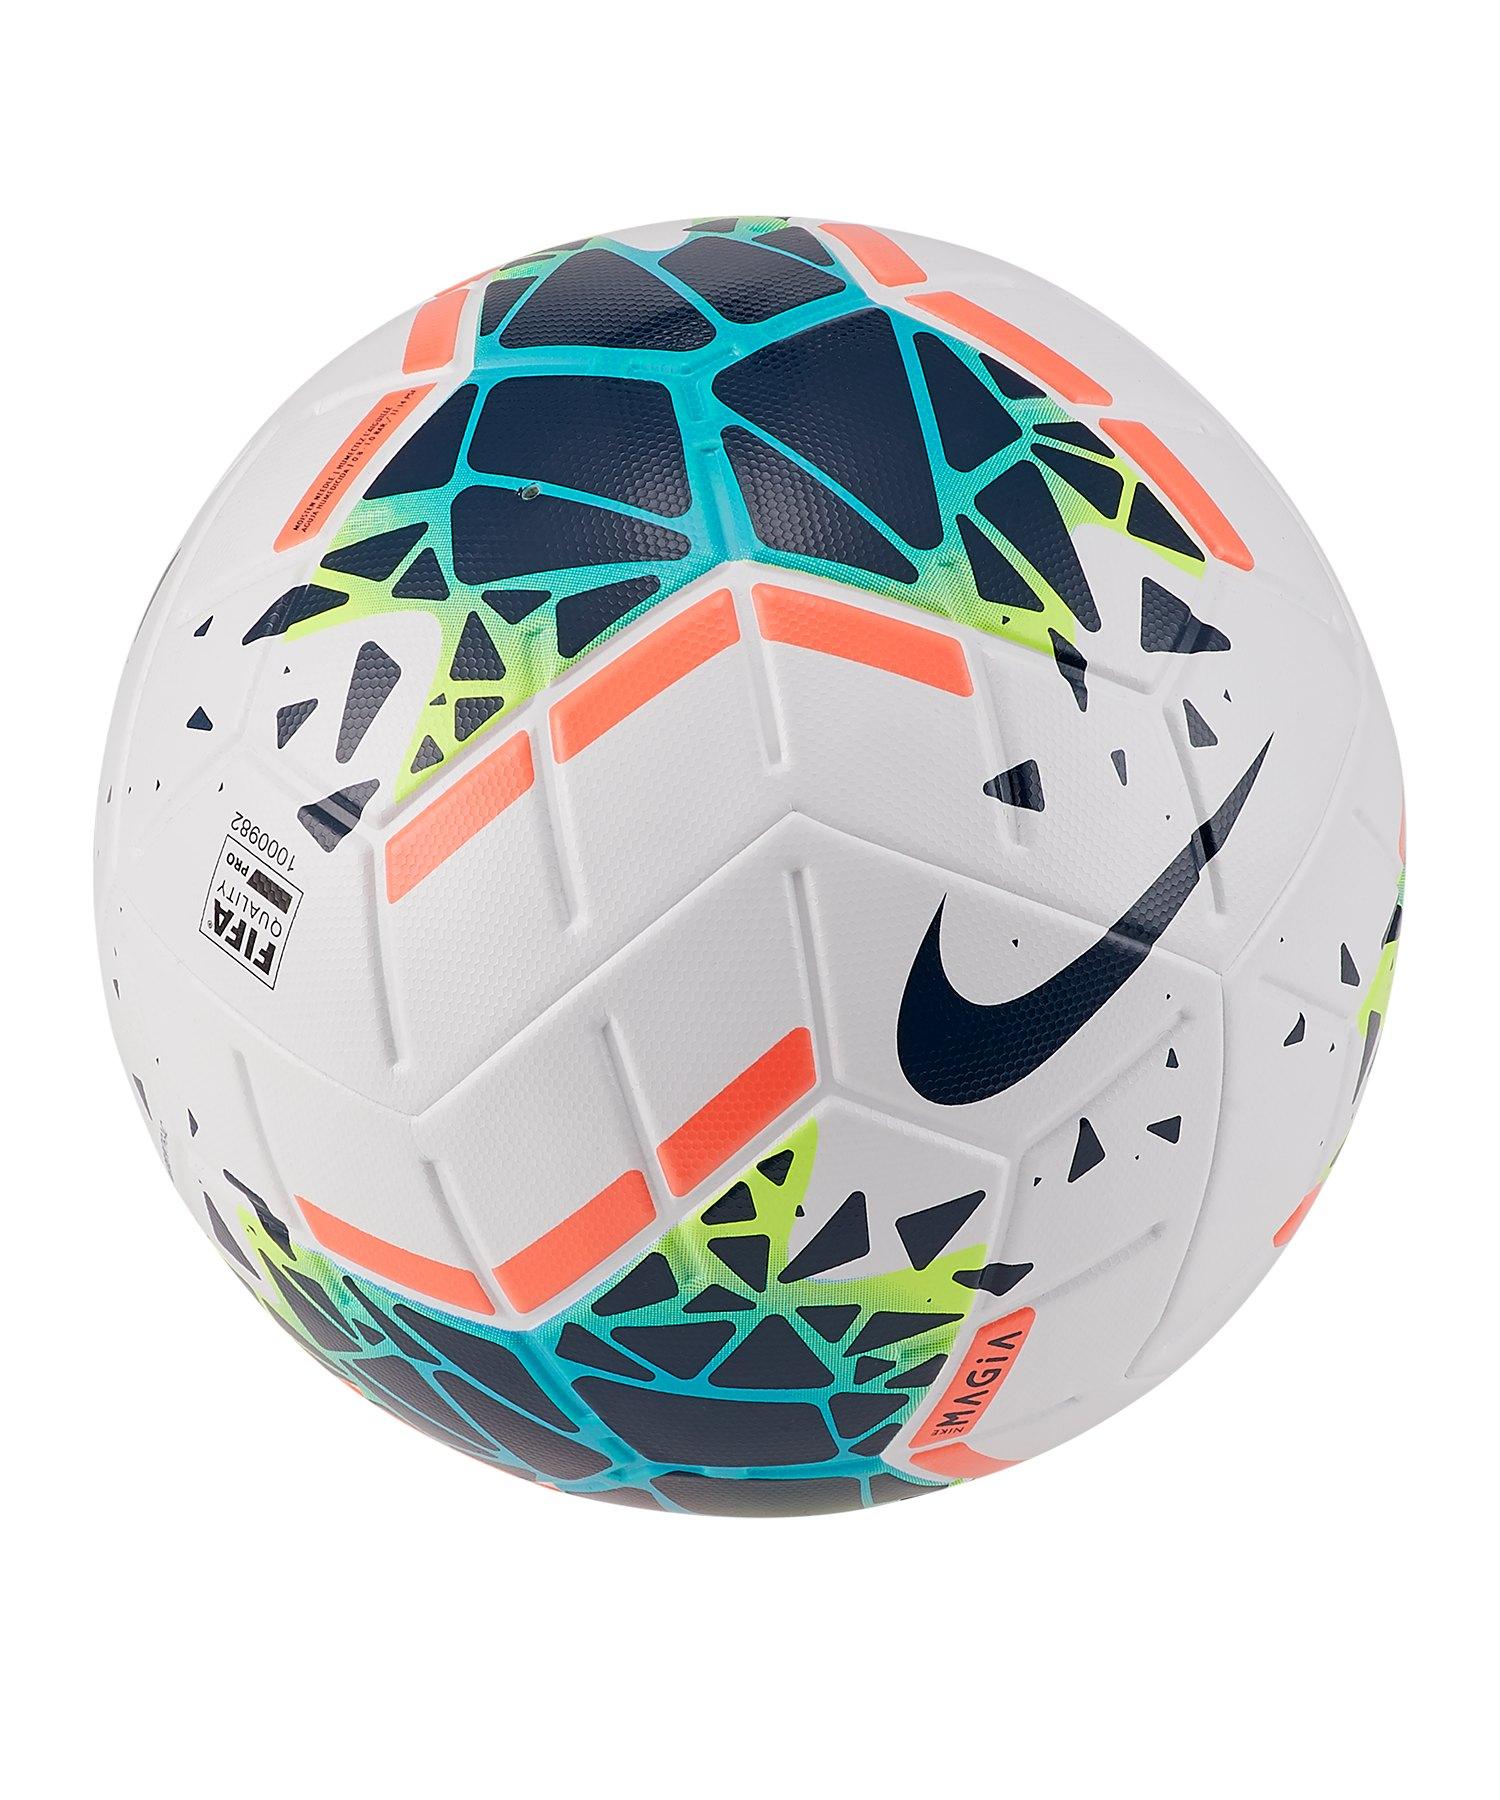 Nike Magia Fussball Weiss F100 - weiss